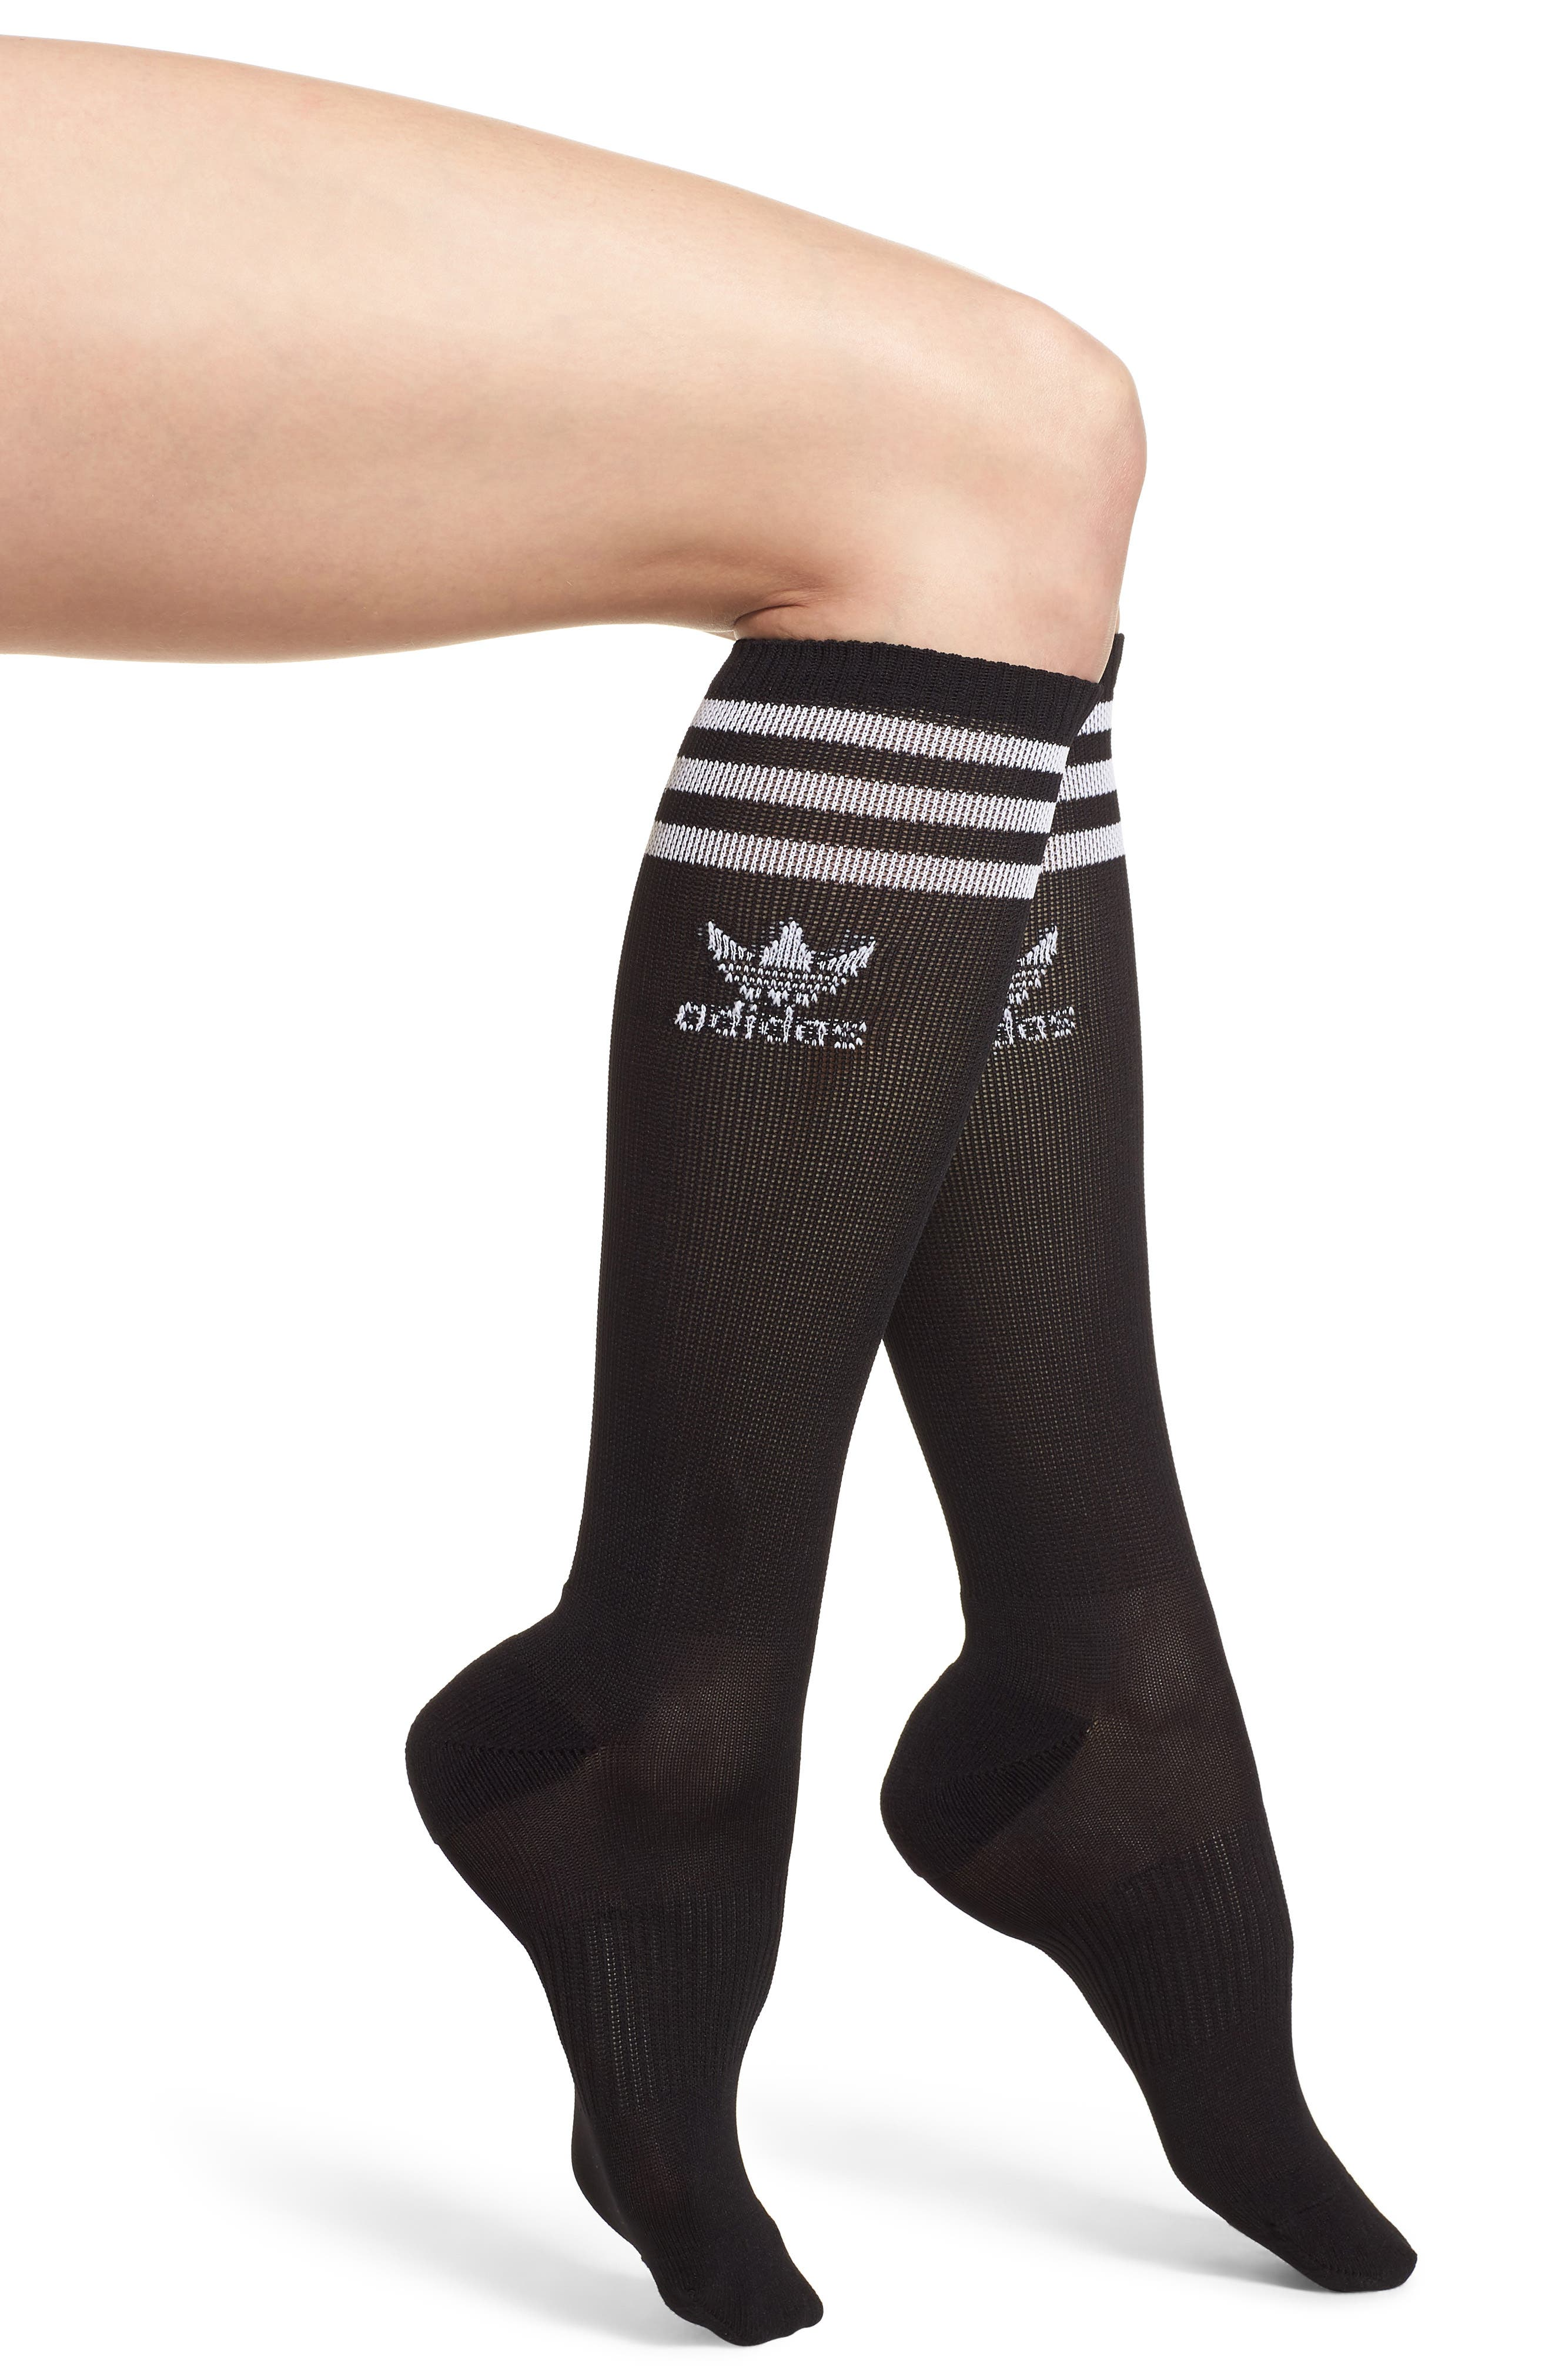 Roller Knee High Socks,                         Main,                         color, 001